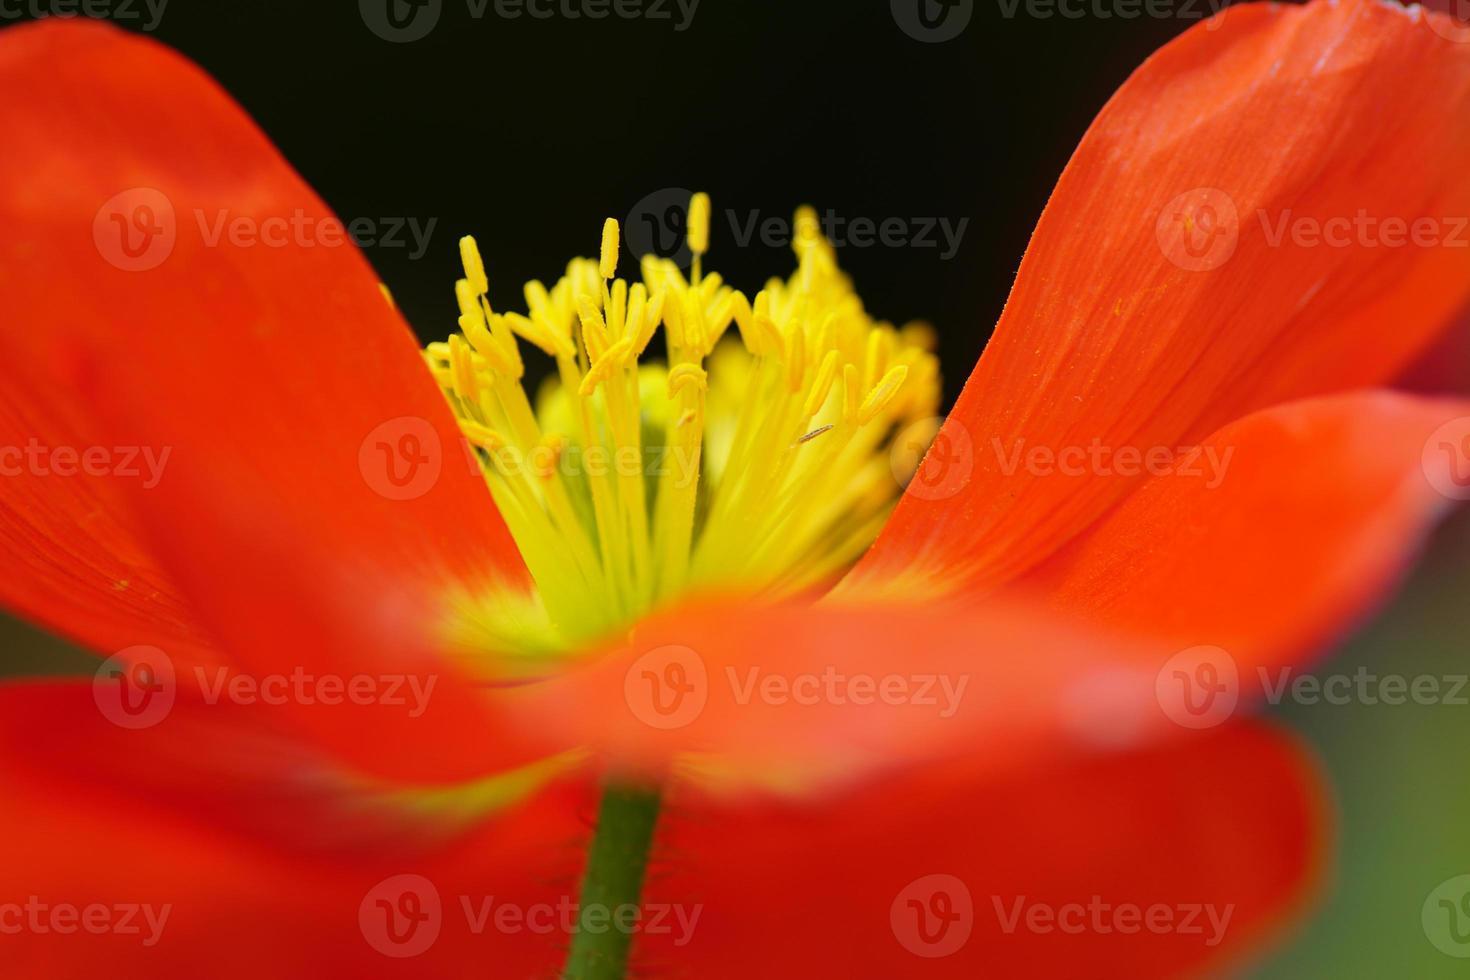 Digital art, paint effect, Macro of corn poppy flowers photo